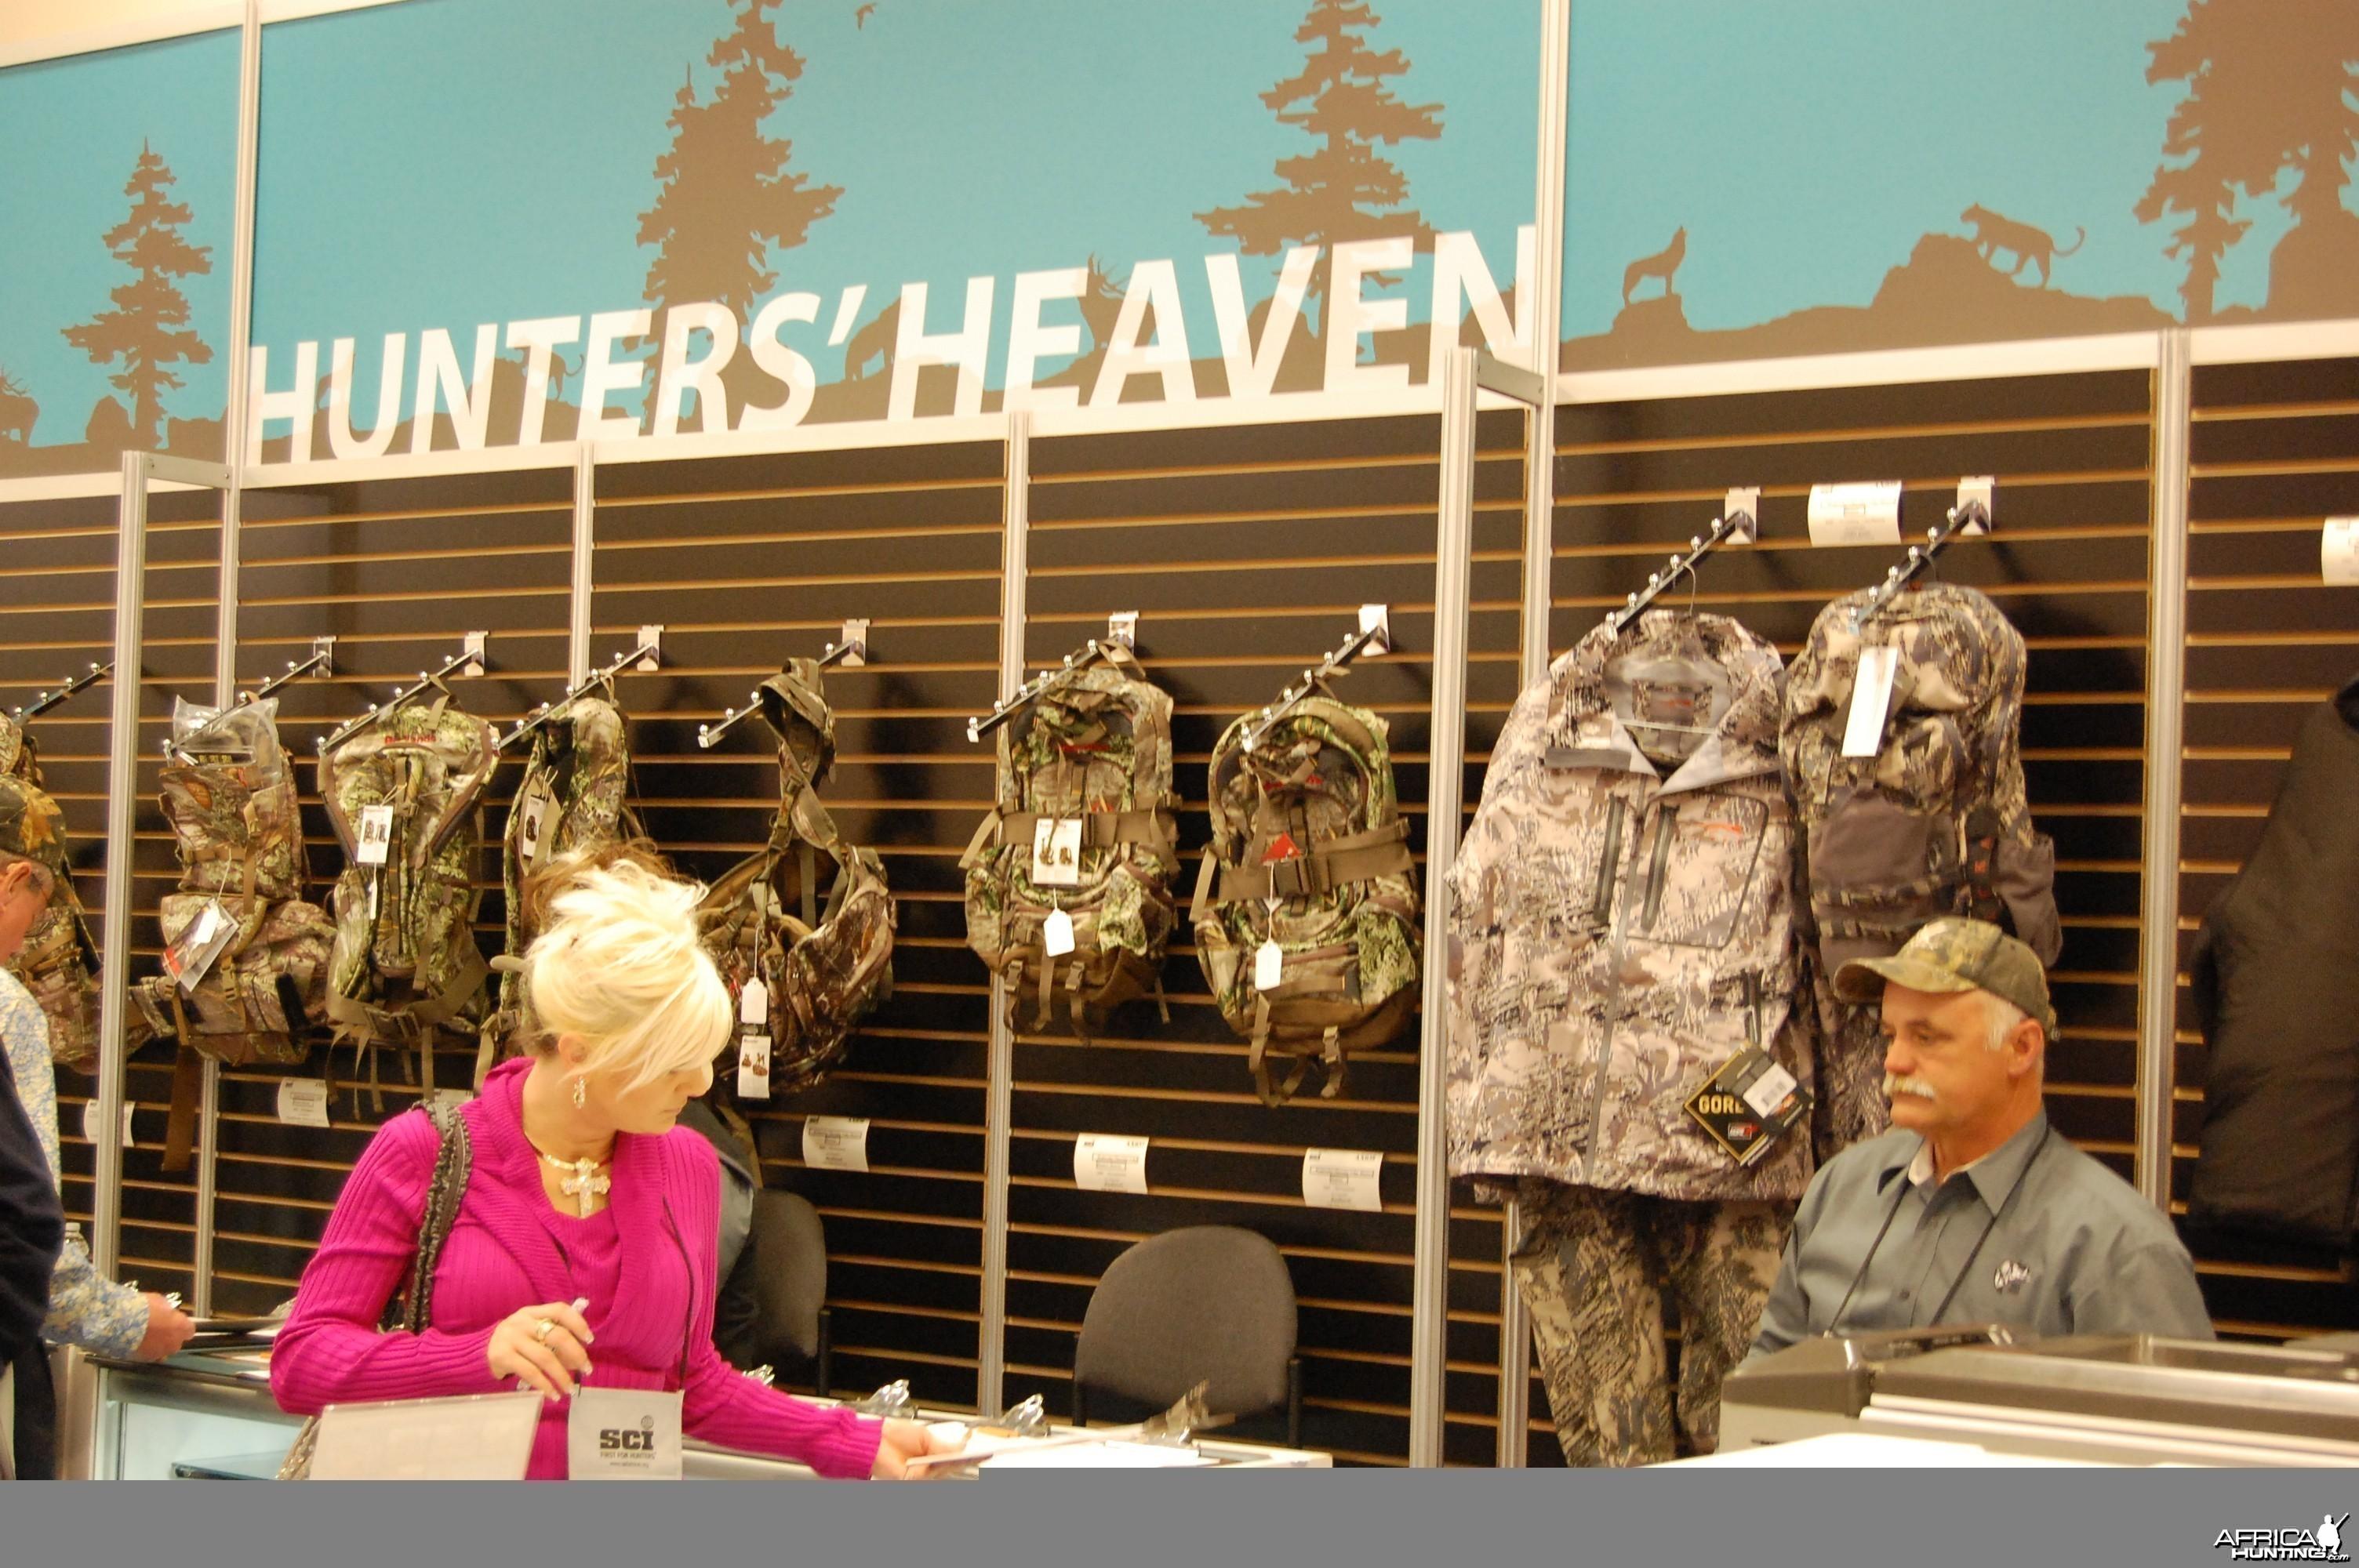 hunters Heaven